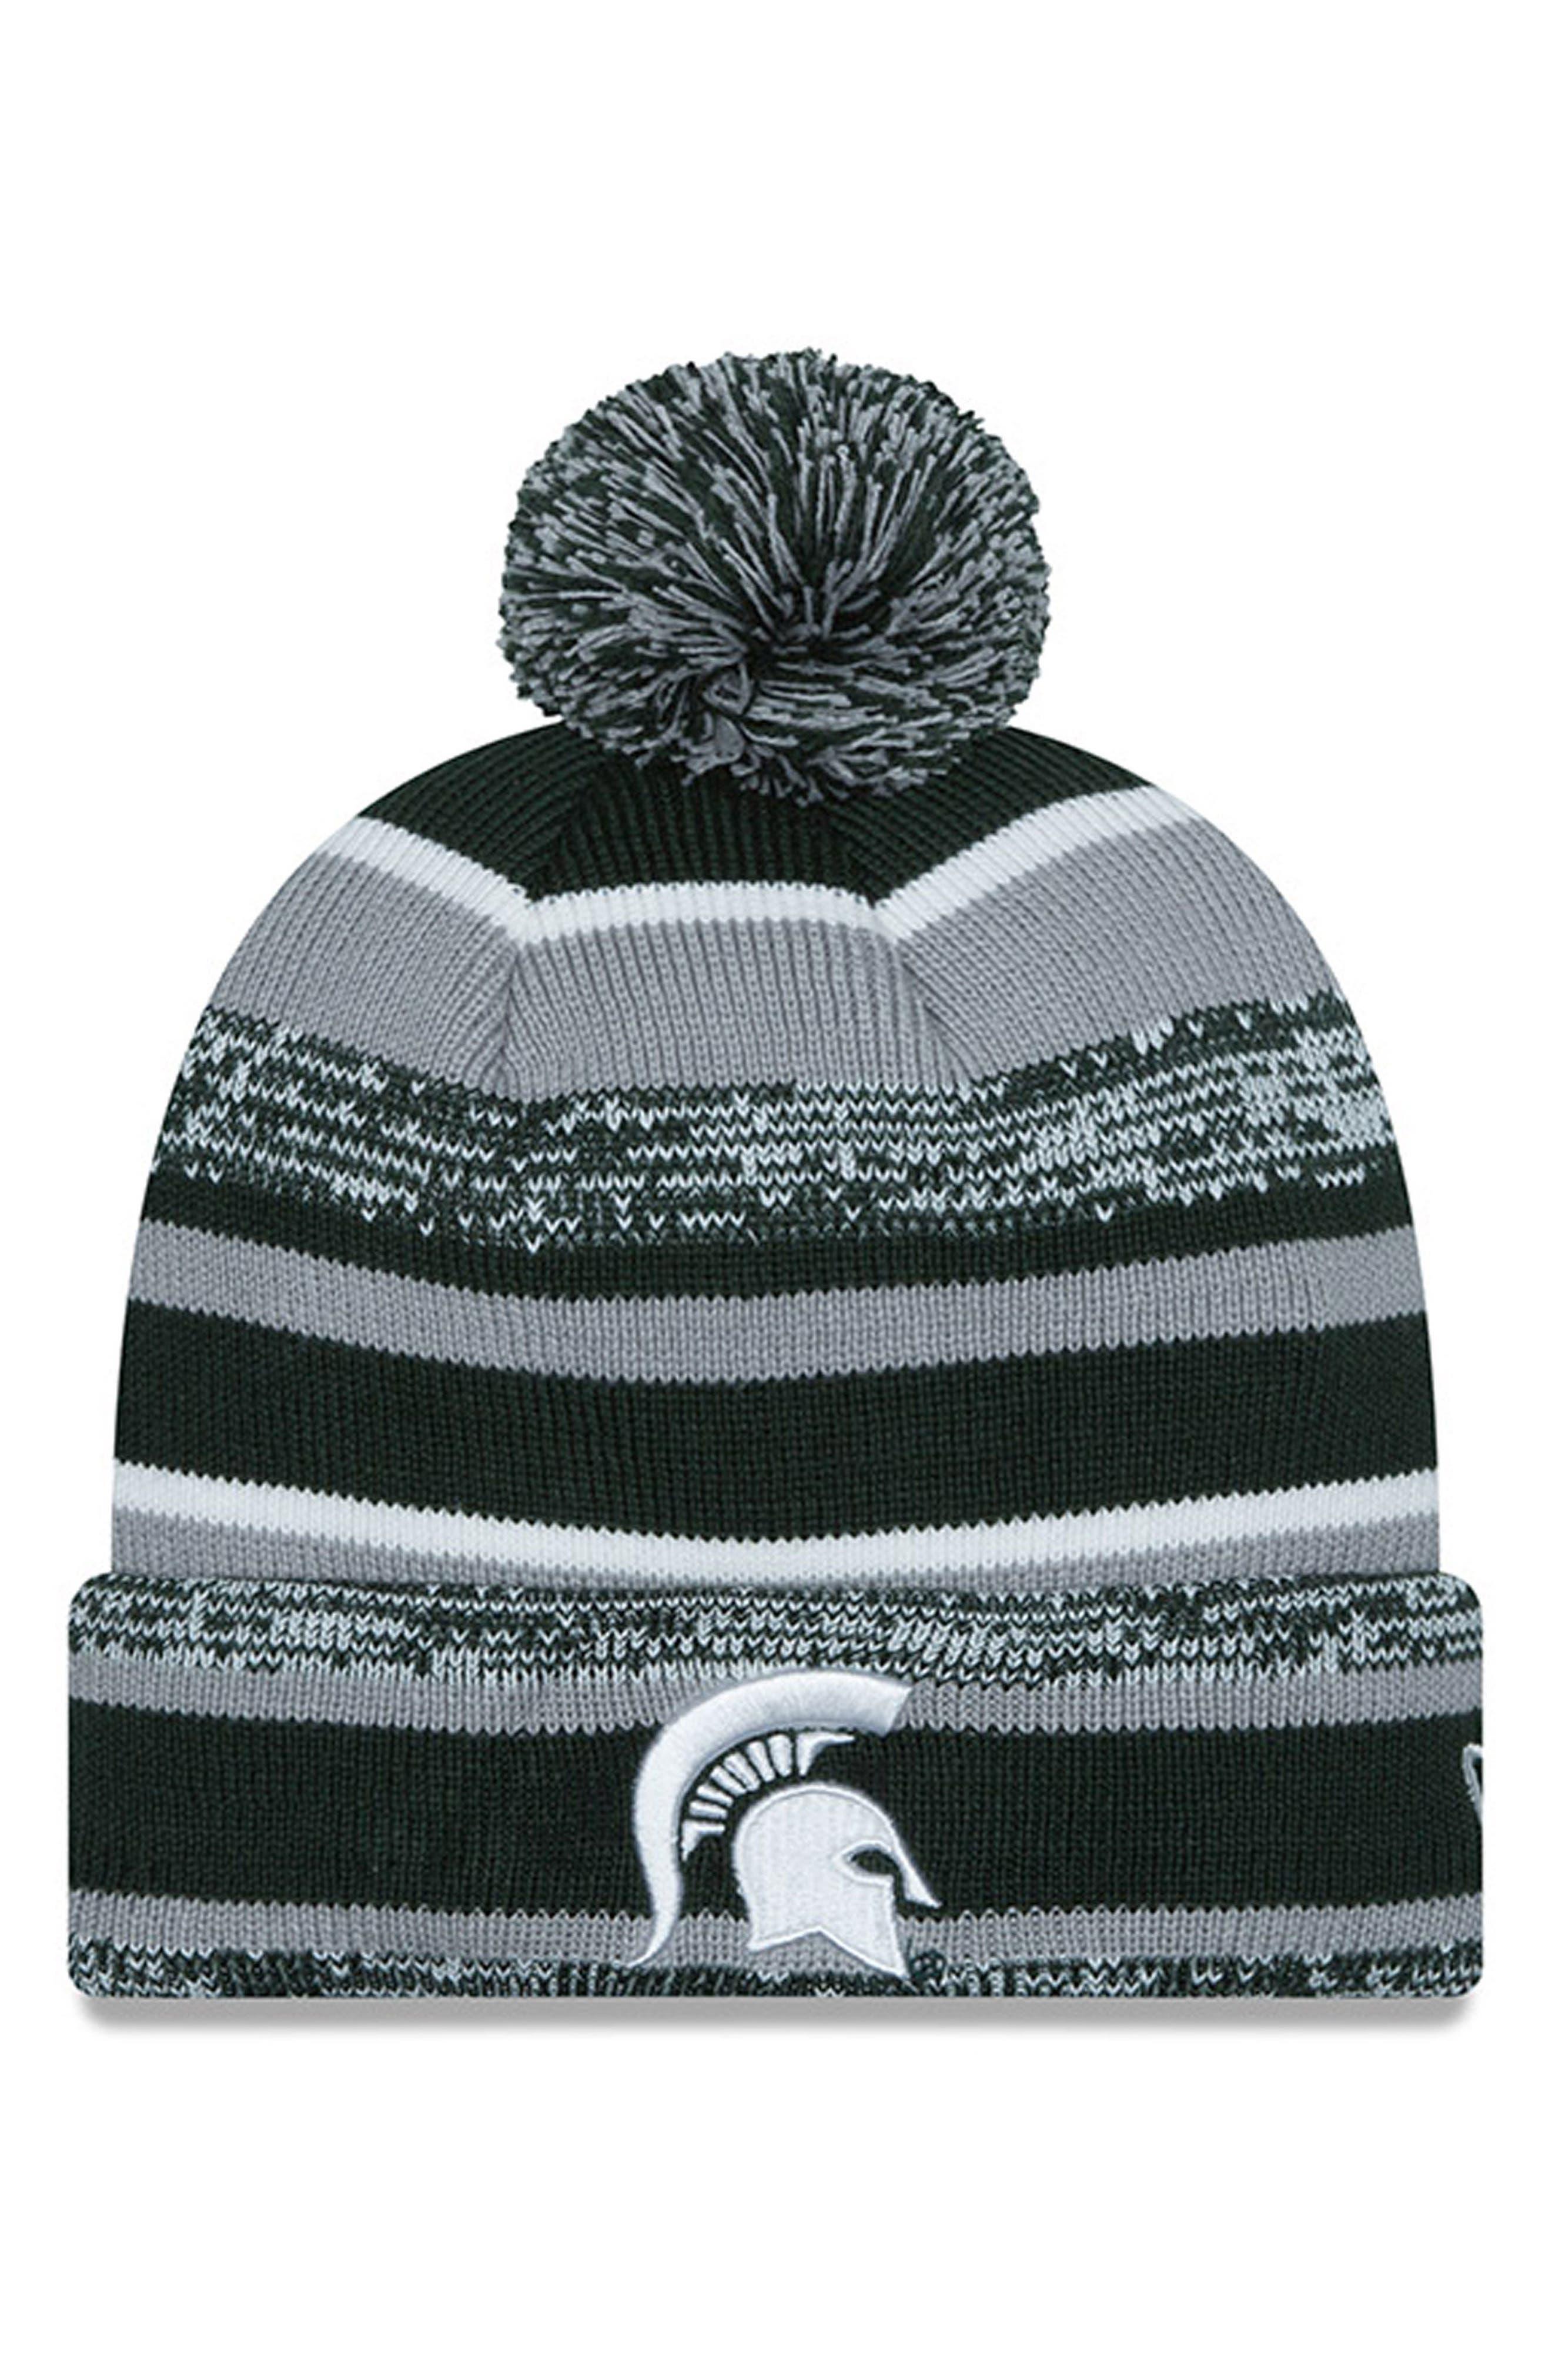 Alternate Image 1 Selected - New Era Cap Collegiate Logo Knit Beanie